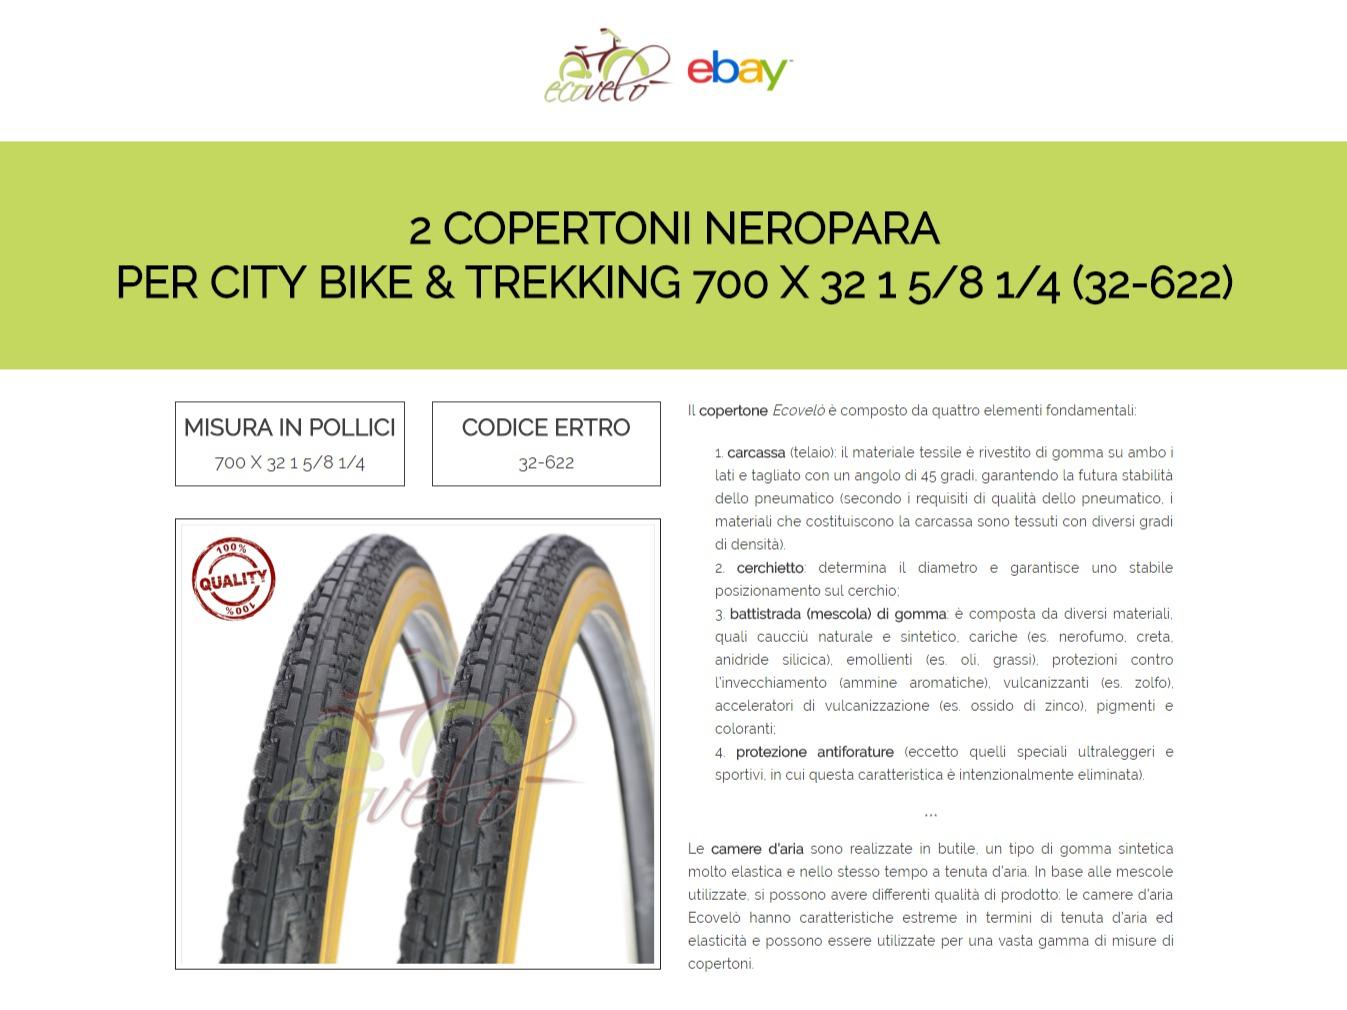 2 COPERTONI PNEUMATICI BICI BICICLETTA CITY TREKKING NERO 700 32 28 1 5//8 1//4